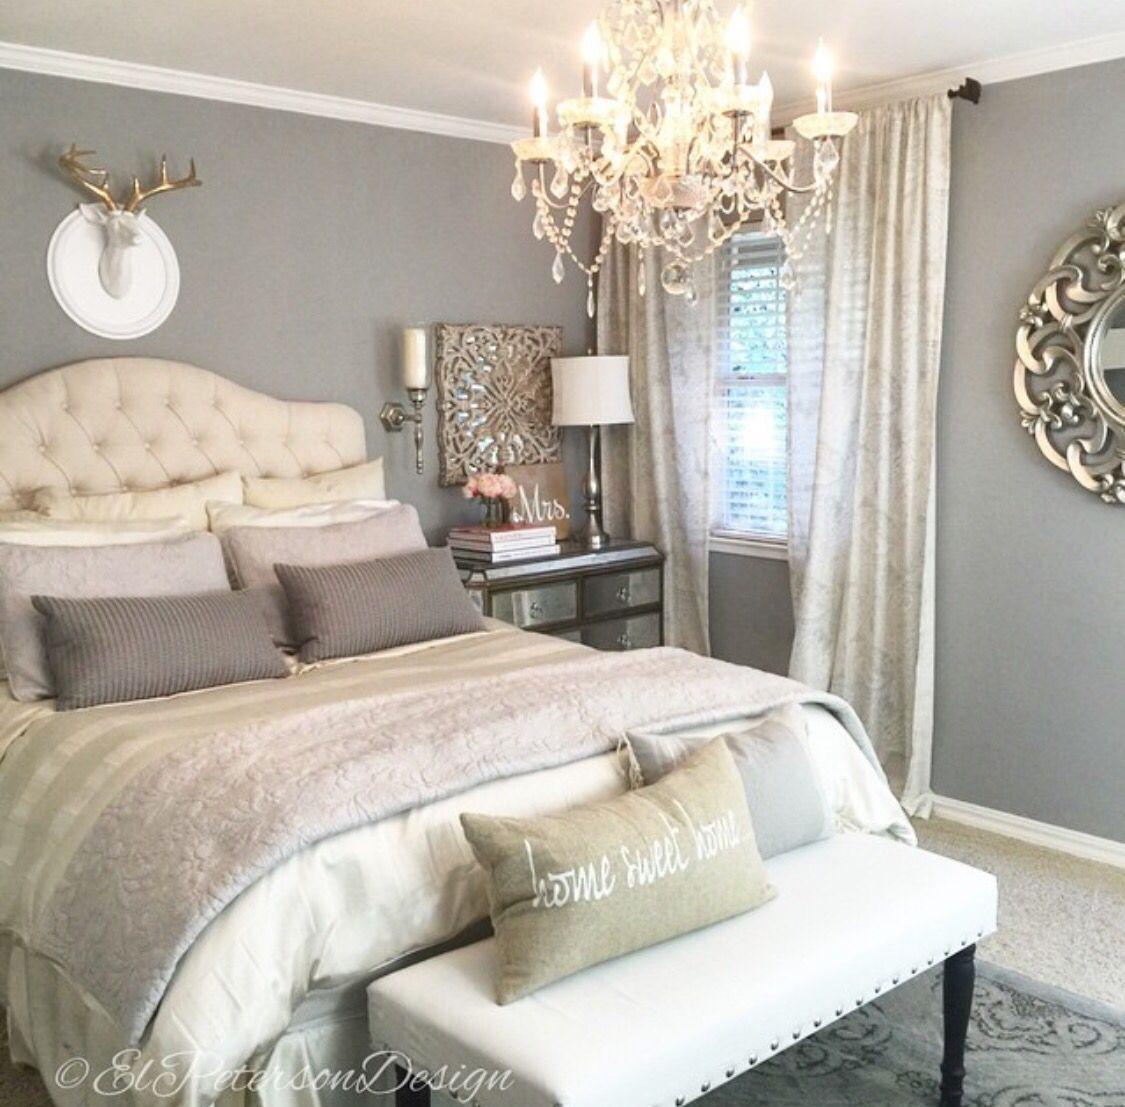 Elpetersondesign Master Bedroom Design Elegant And Chic Www